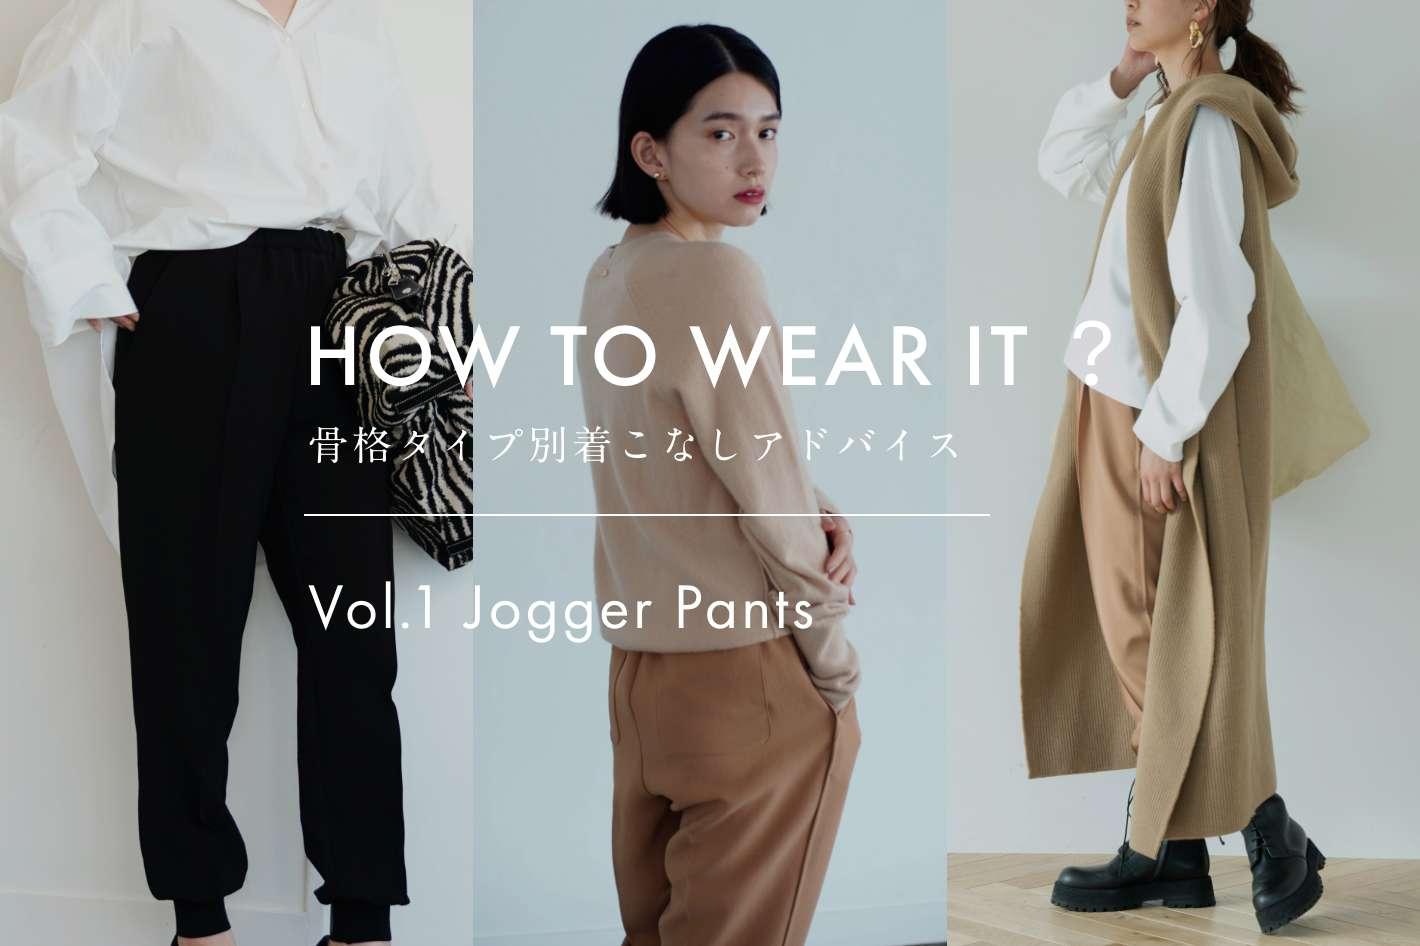 GALLARDAGALANTE 《新連載》どう着れば正解?骨格タイプ別着こなしアドバイス Vol.1 Jogger Pants